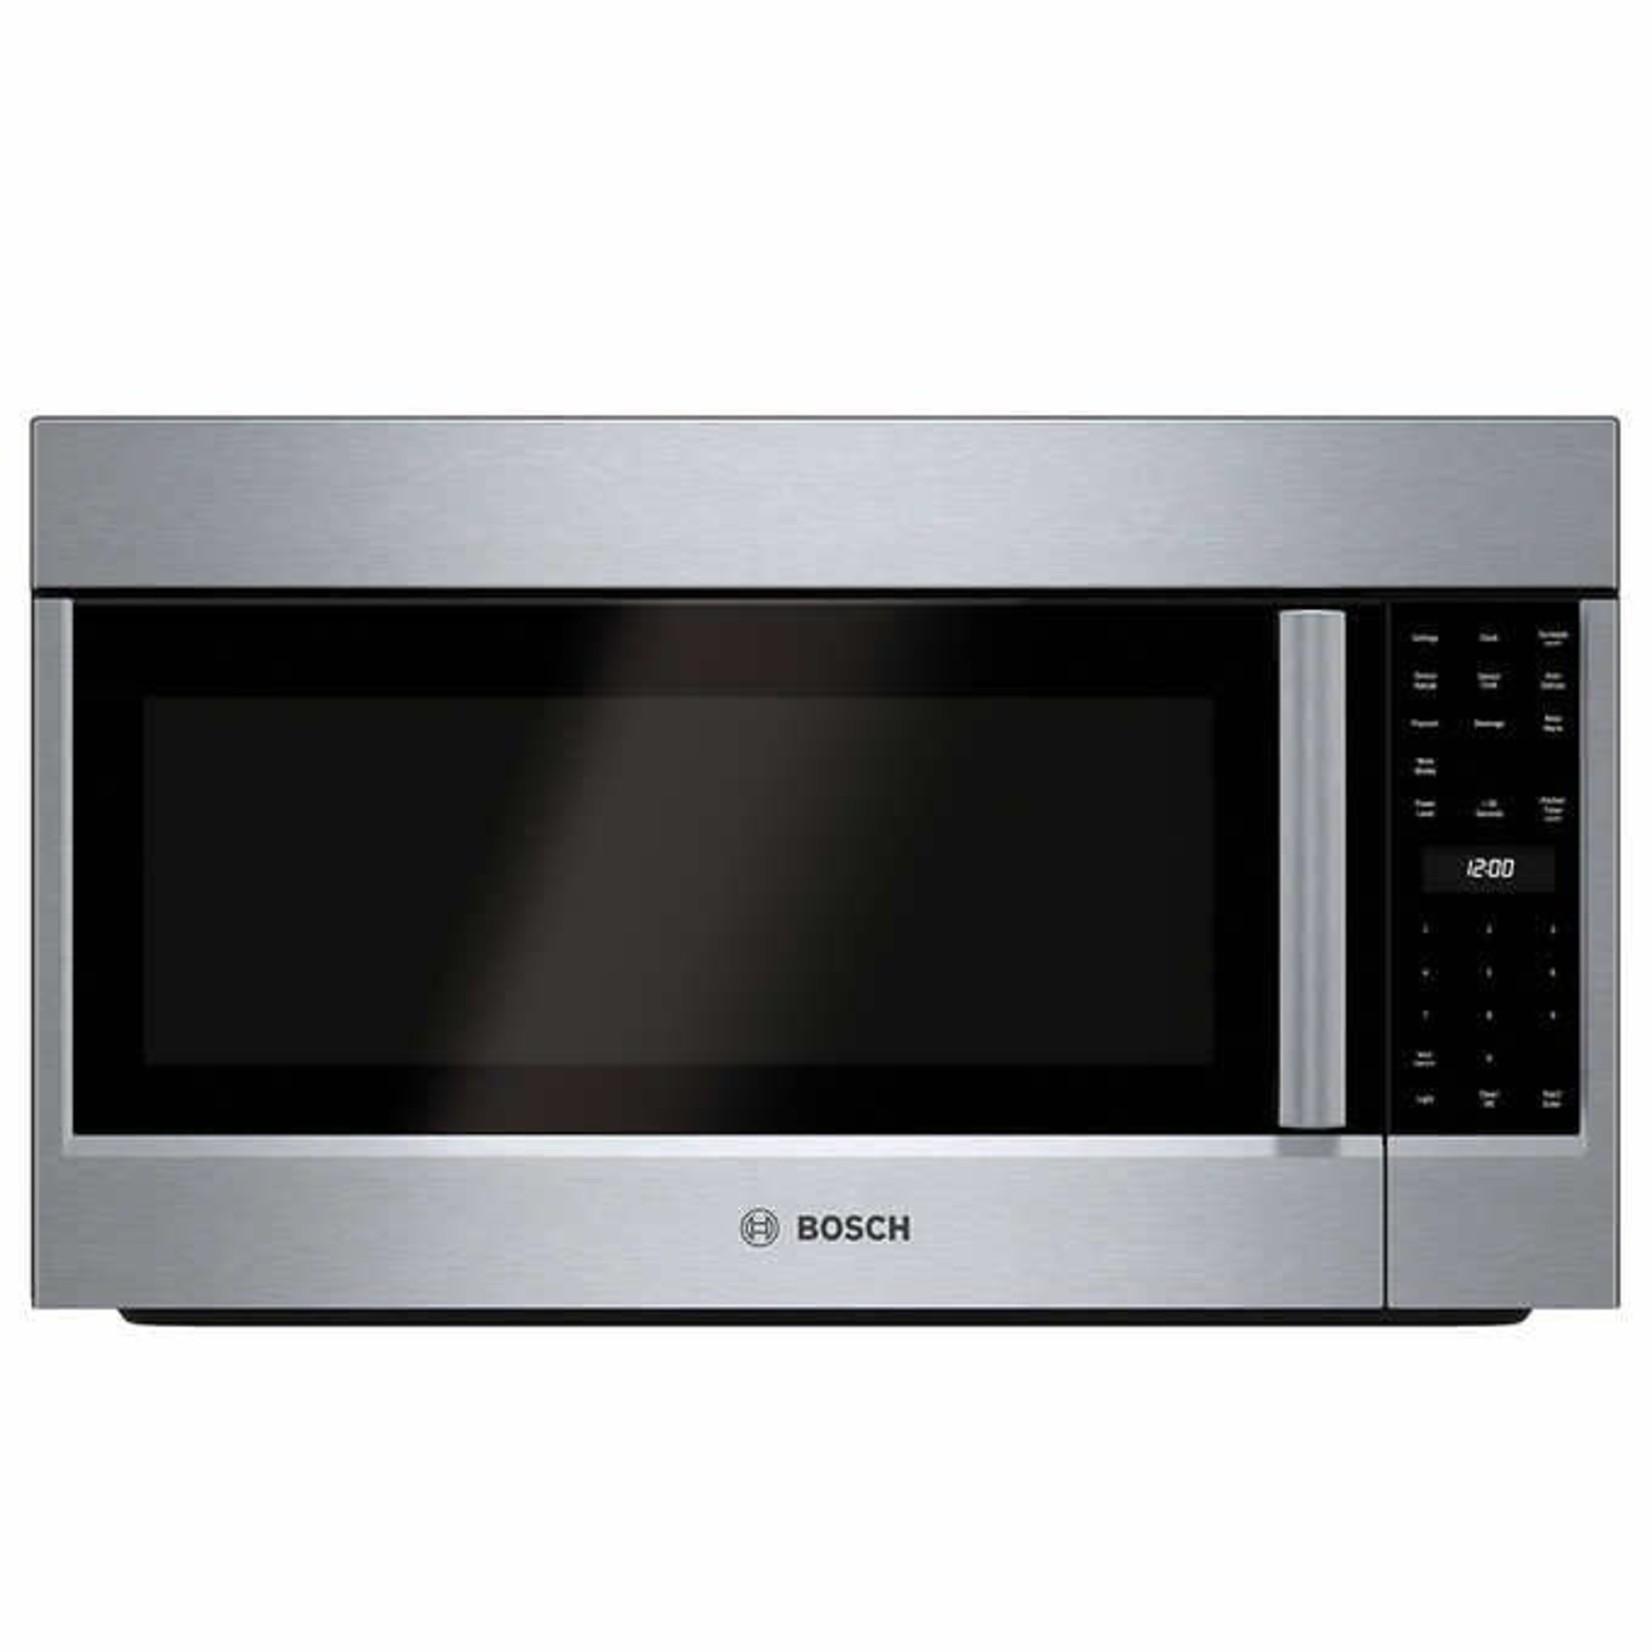 Bosch 500 Series 2.1 cu. ft. Stainless-steel Over-the-range Microwave, 385 CFM HMV5053C